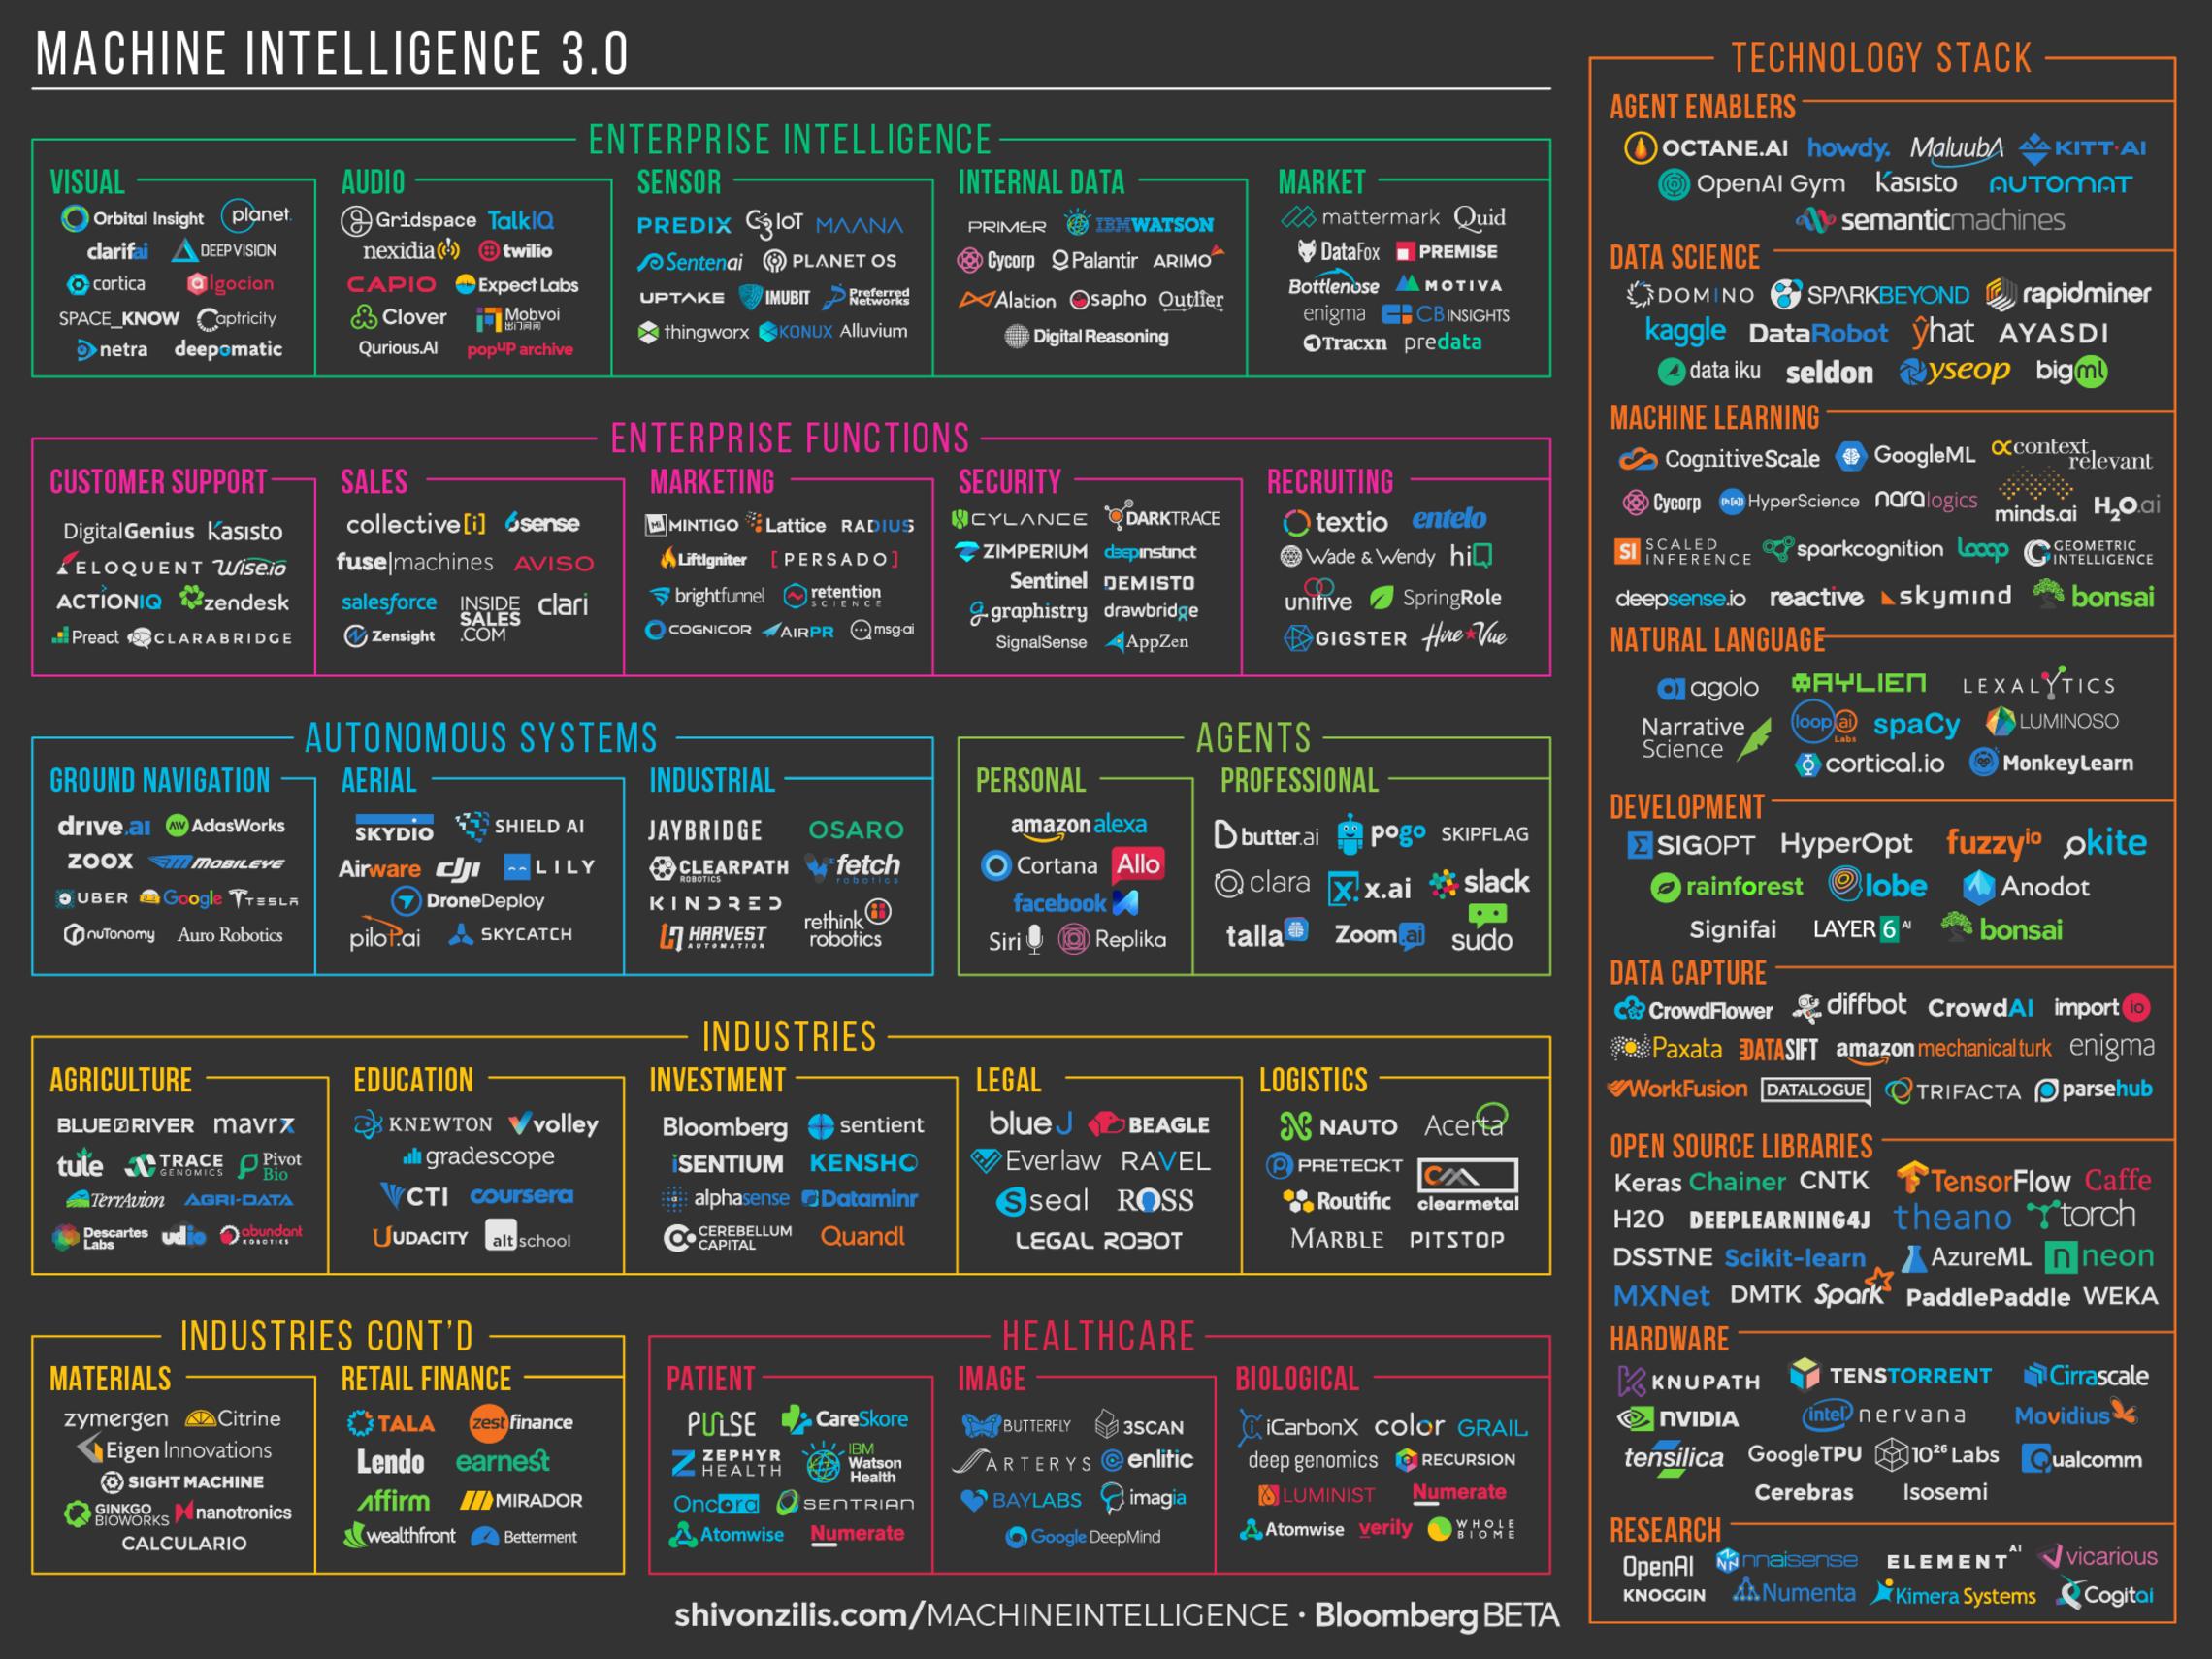 Machine Intelligence 3.0 landscape